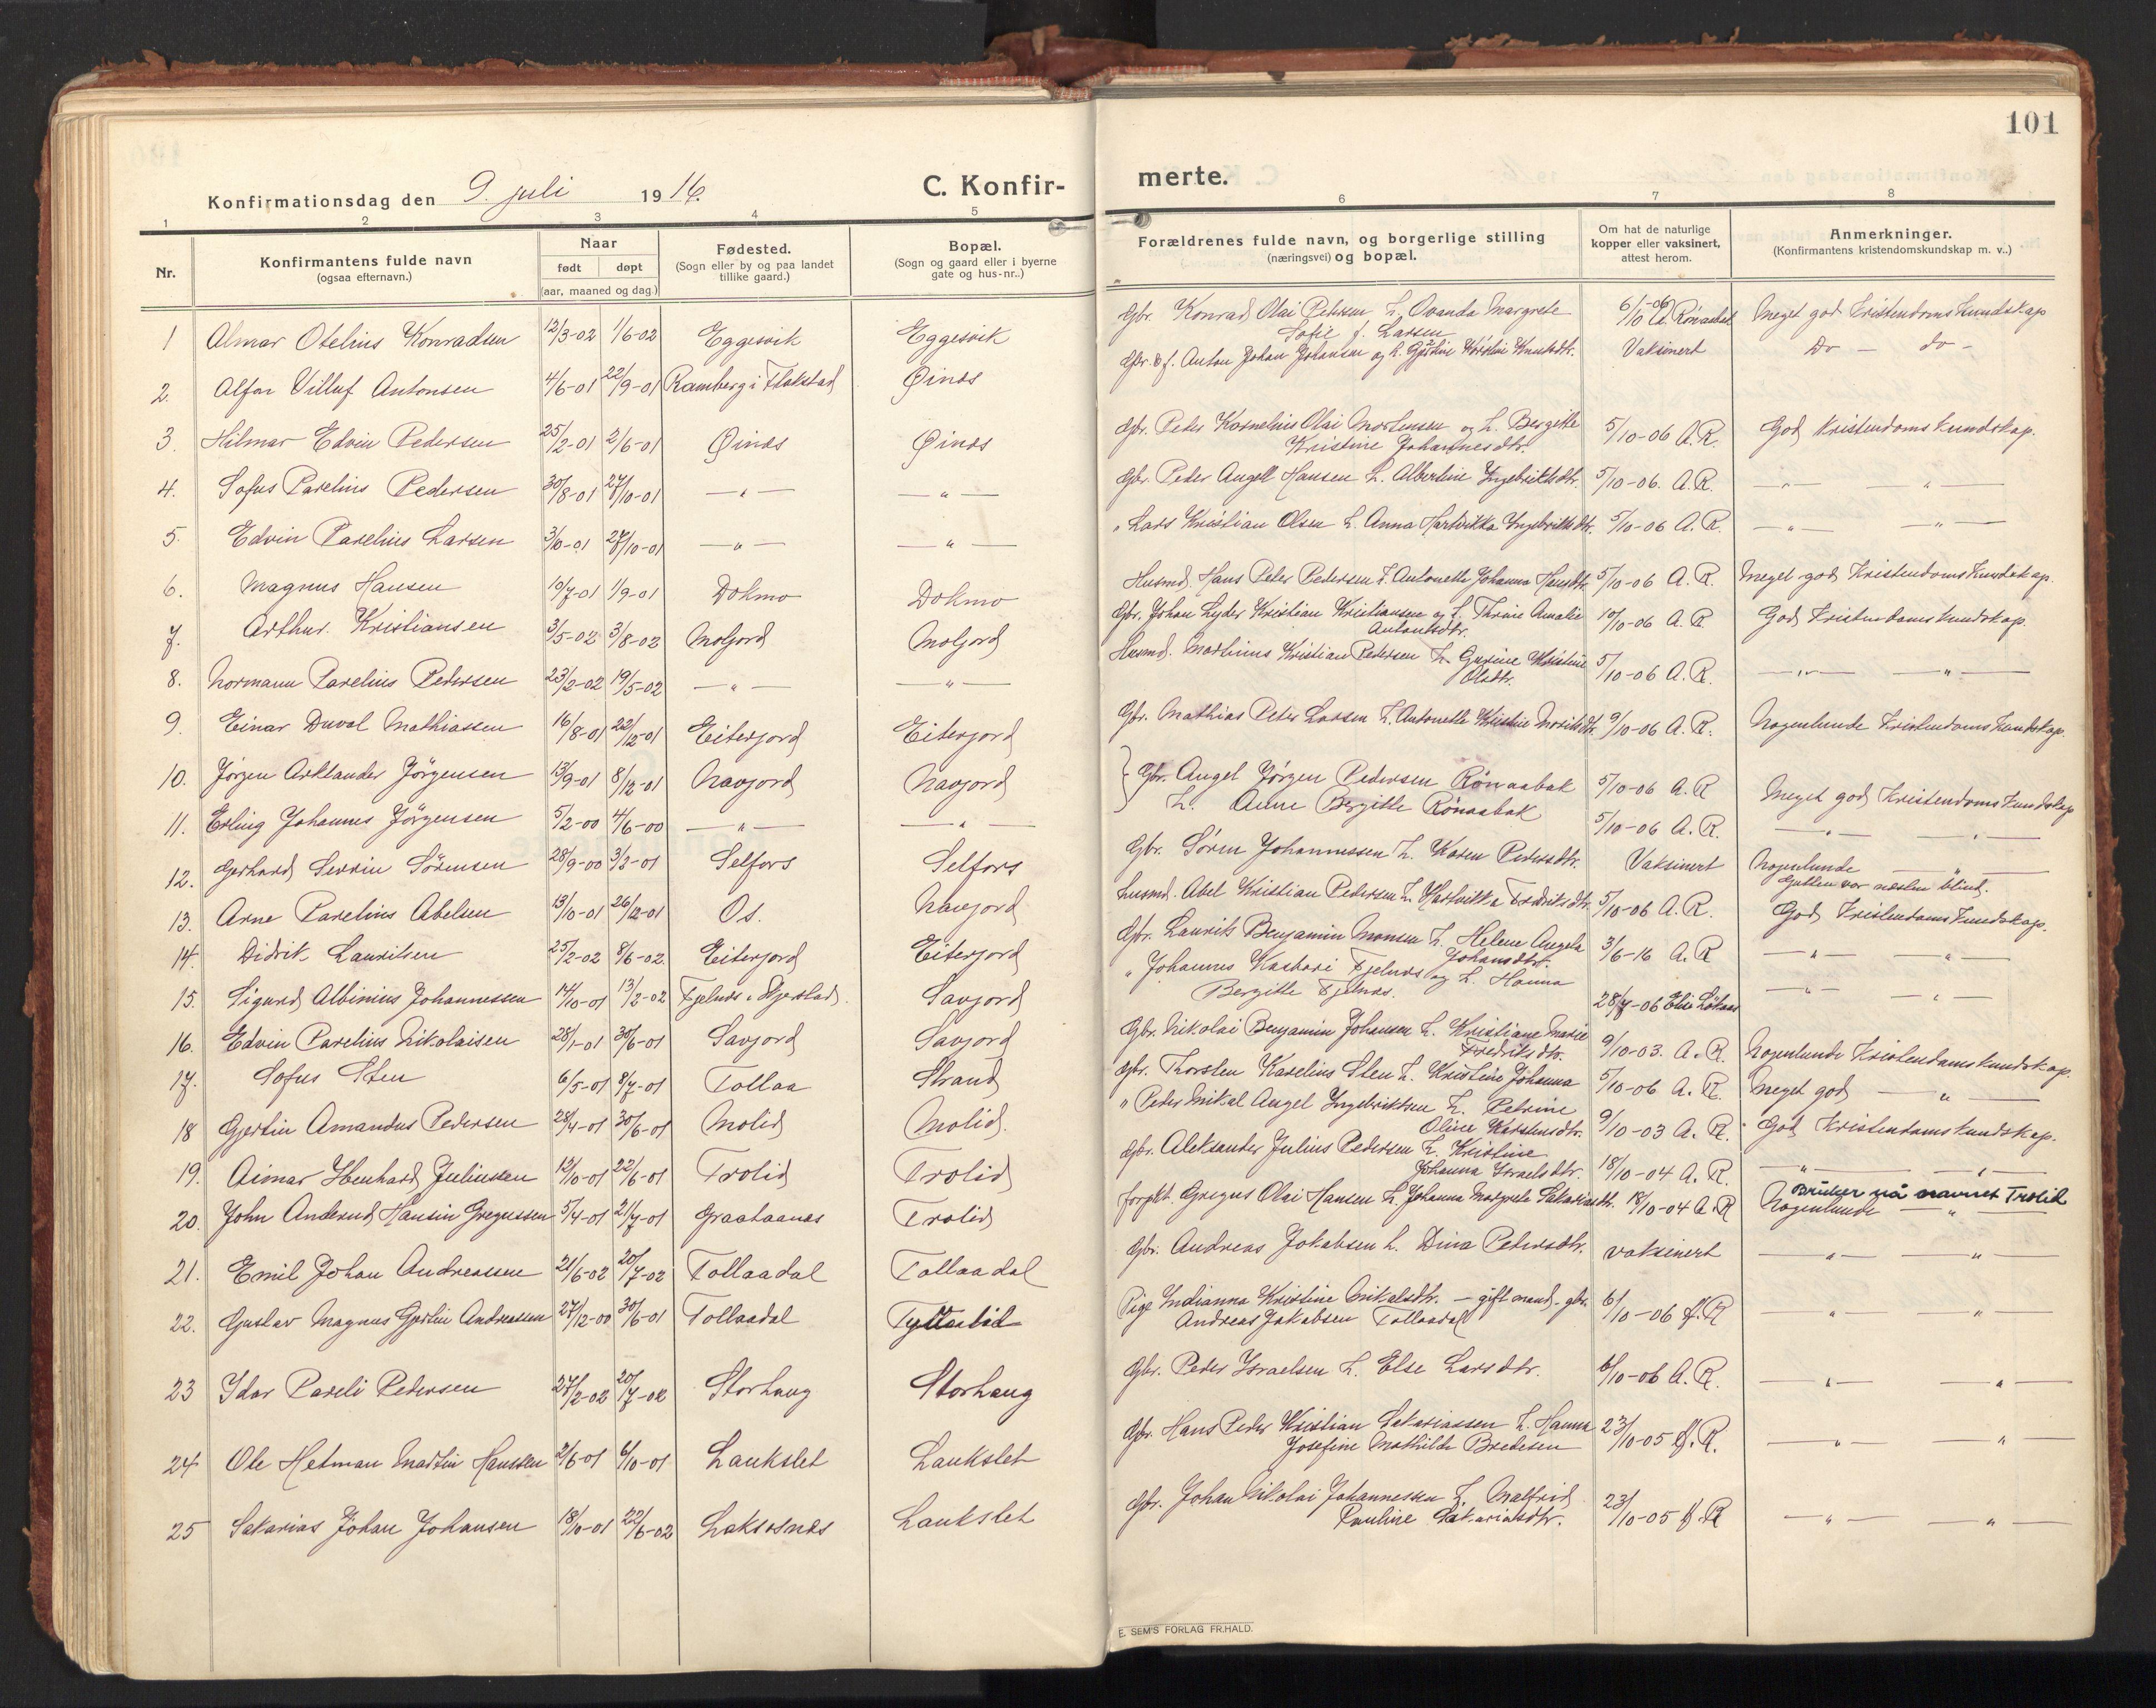 SAT, Ministerialprotokoller, klokkerbøker og fødselsregistre - Nordland, 846/L0650: Ministerialbok nr. 846A08, 1916-1935, s. 101